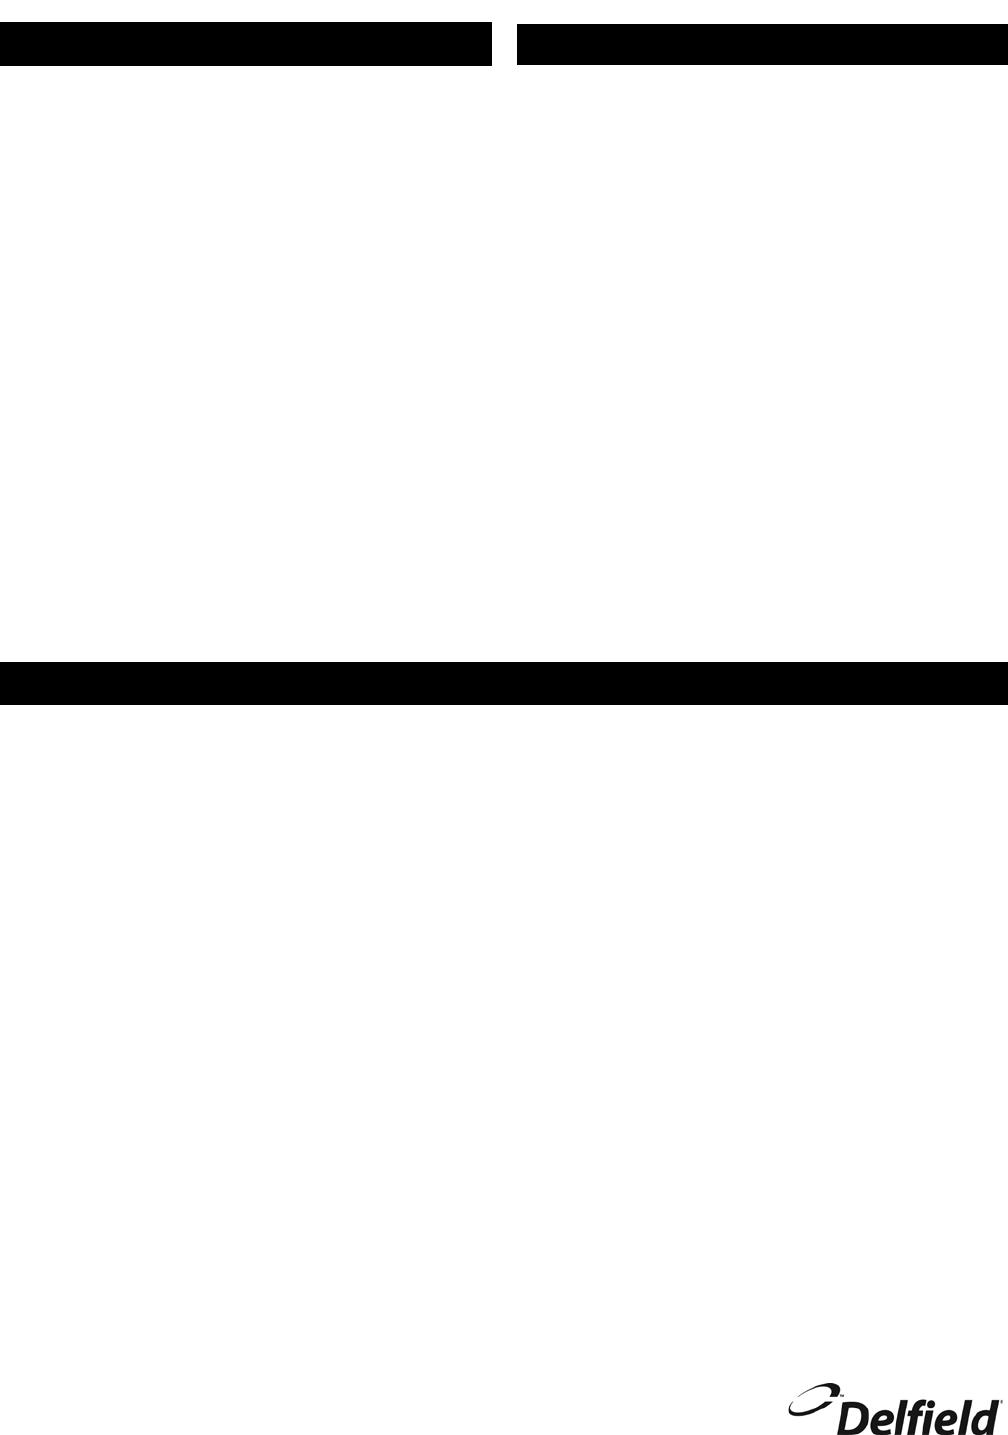 [SCHEMATICS_4CA]  Delfield Enodis 400 Series Users Manual   Delfield Freezer Wiring Diagram Mini      UserManual.wiki